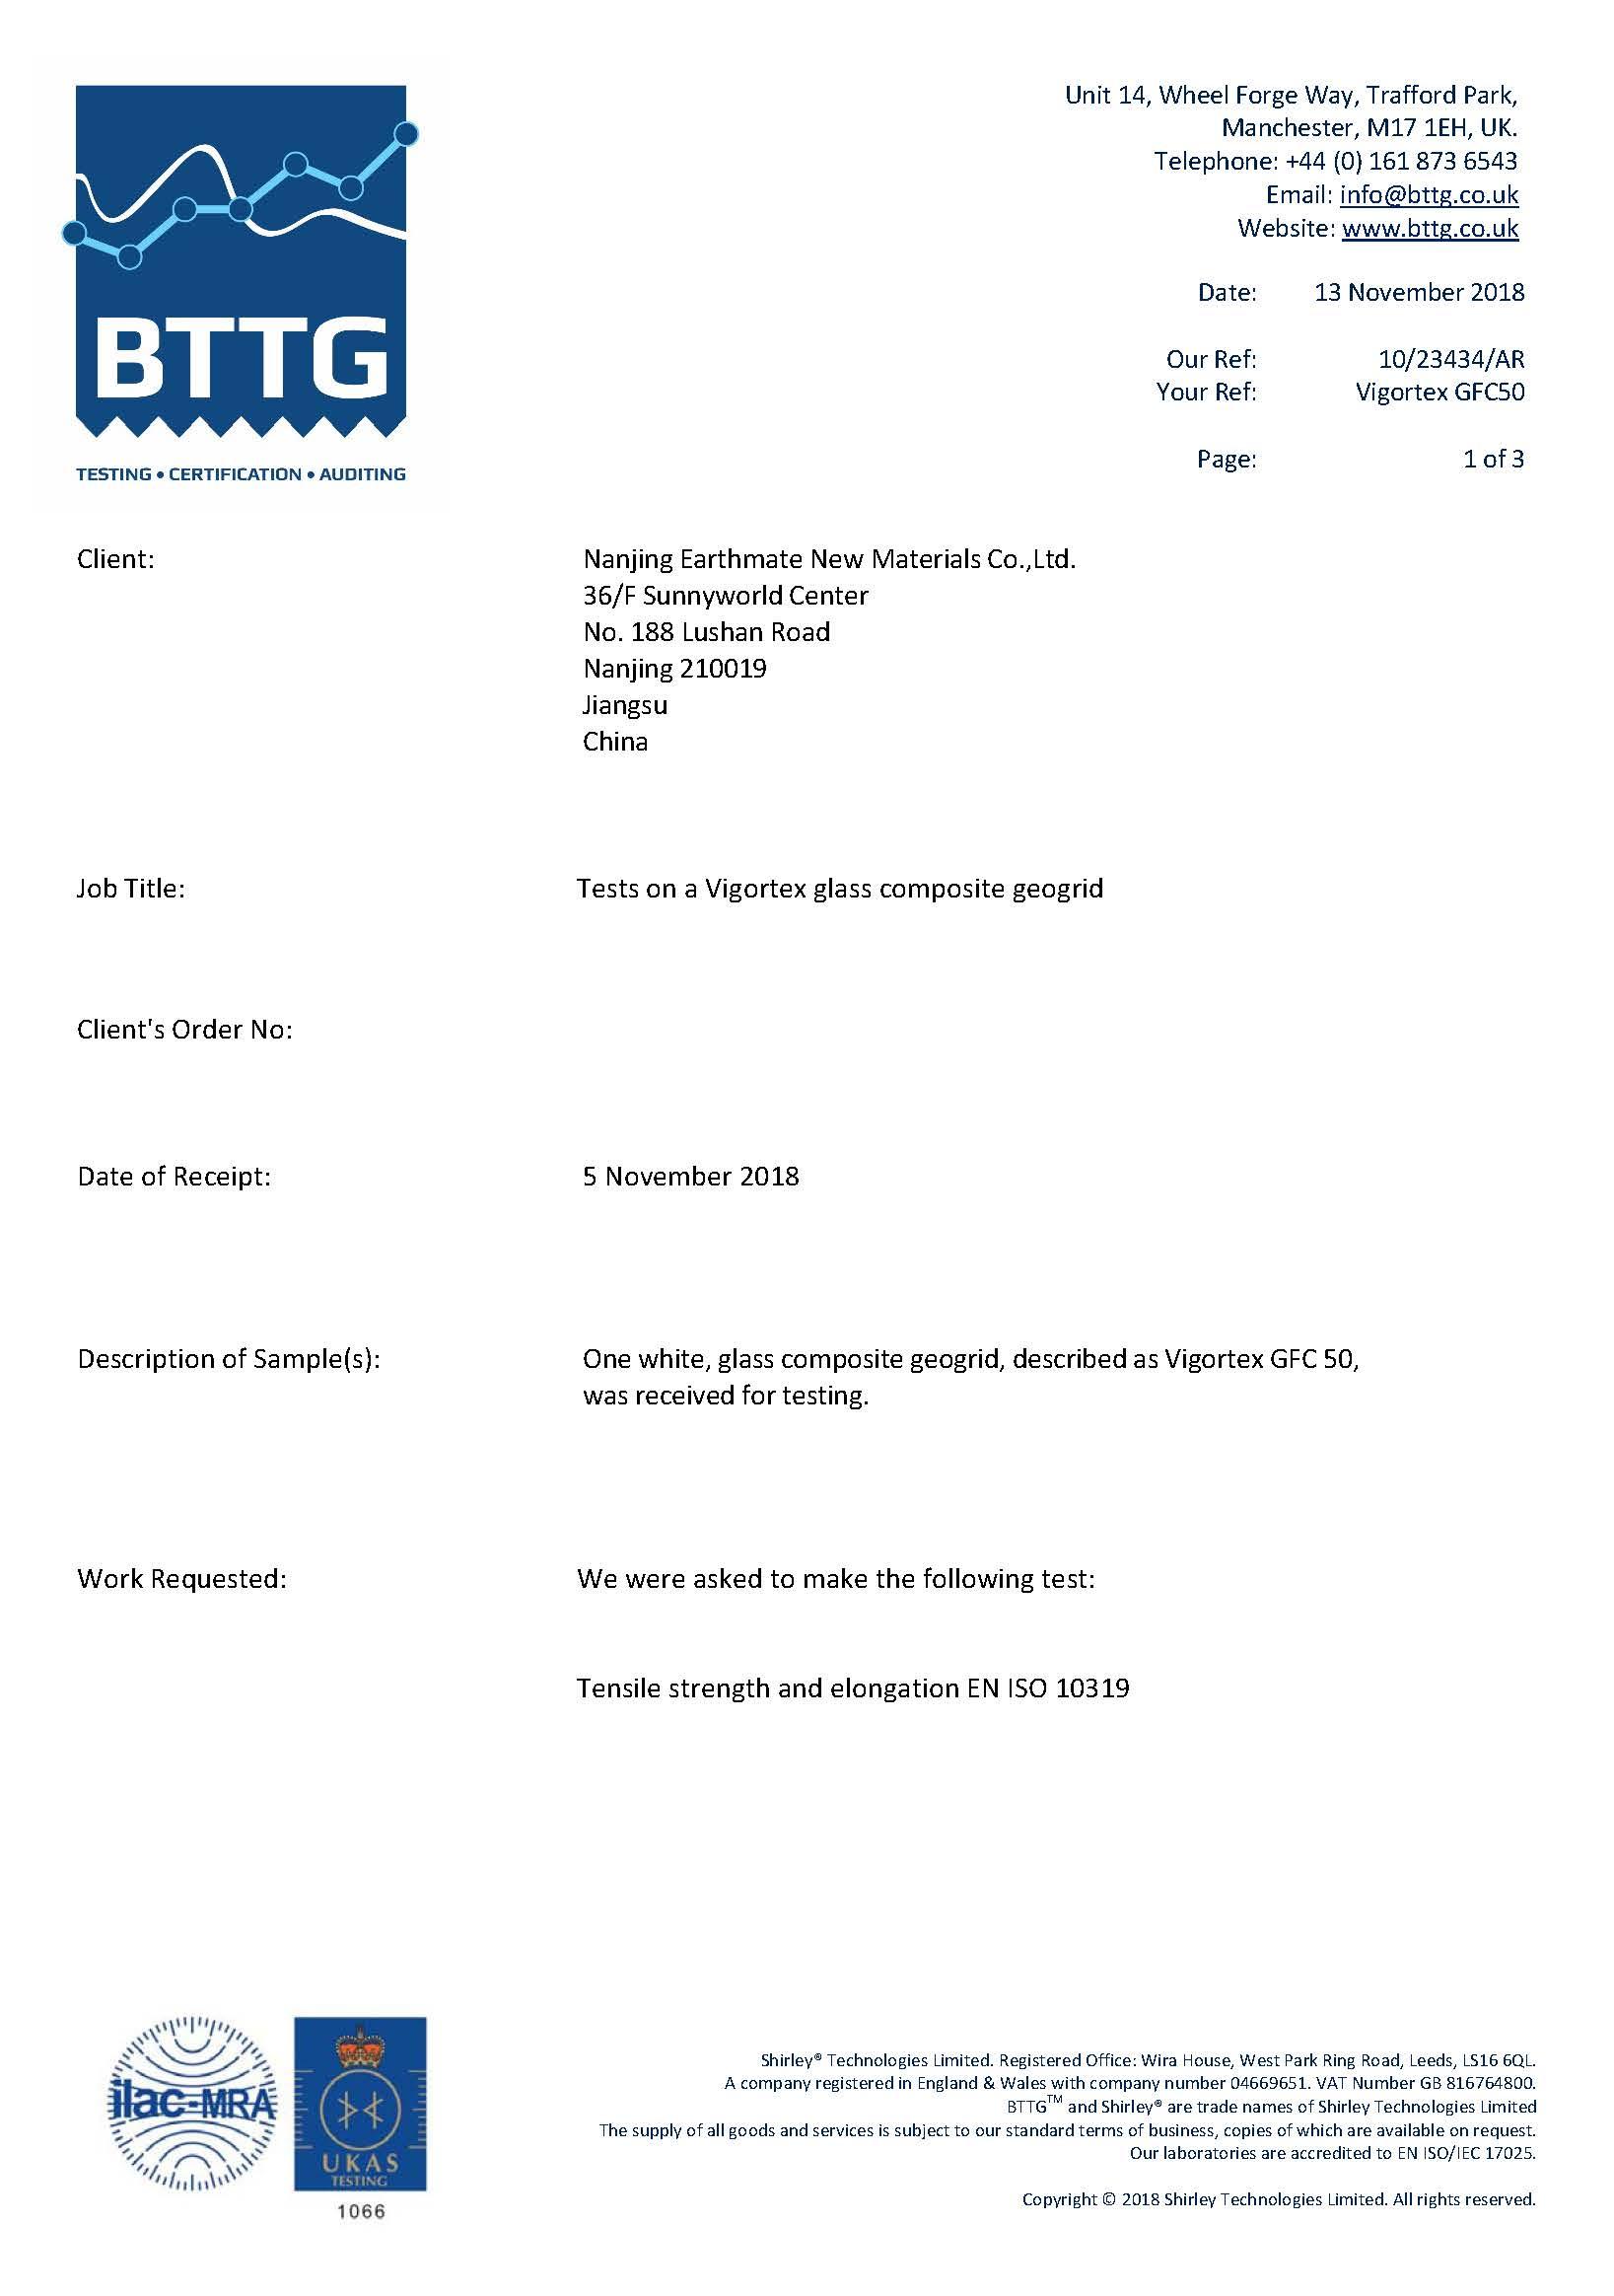 VIGORTEX GFC Testing Report | BTTG, U.K.